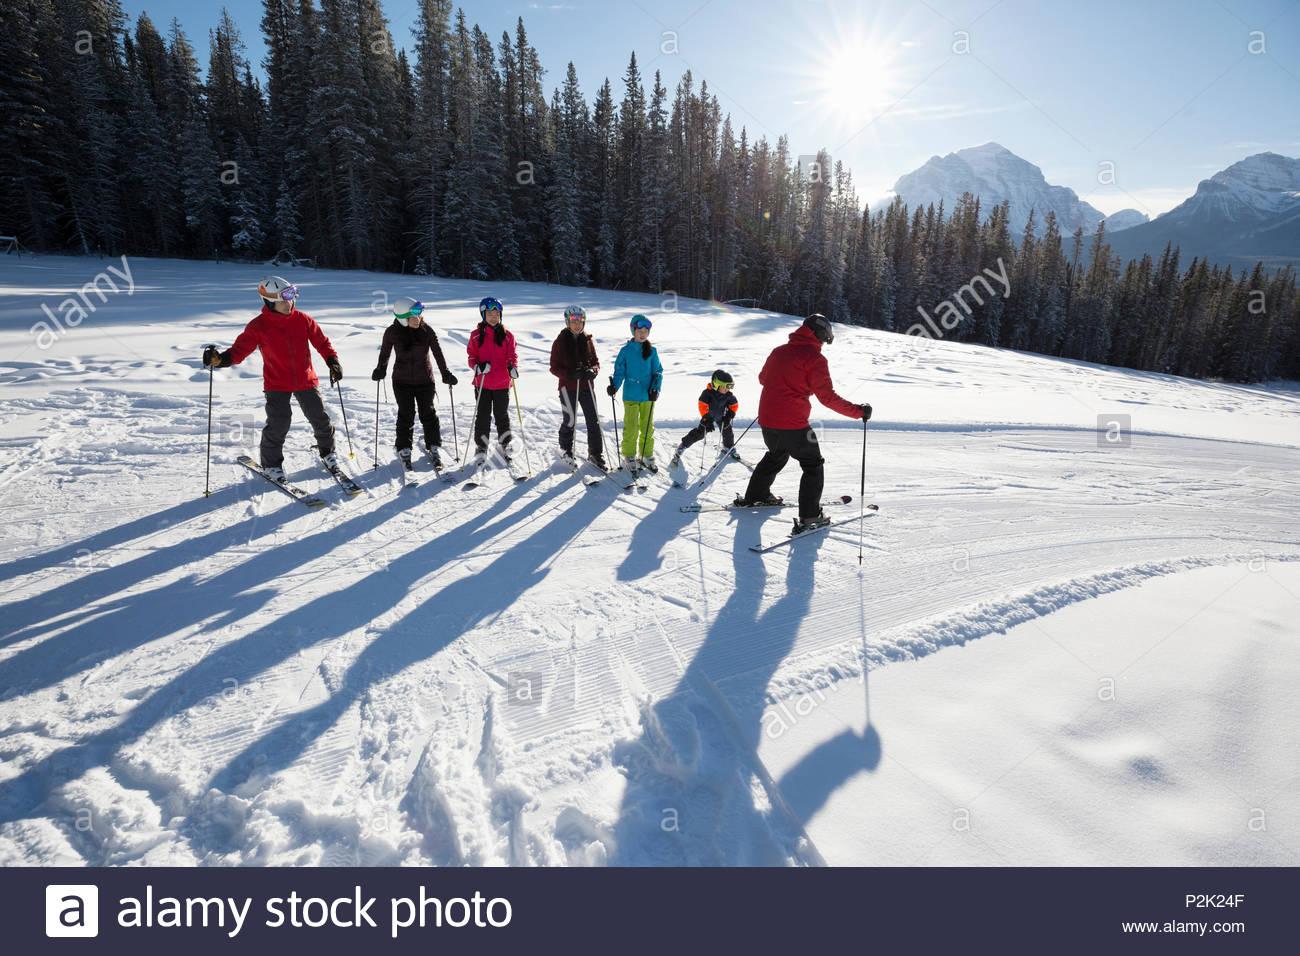 Family receiving group ski lesson from ski resort instructor - Stock Image